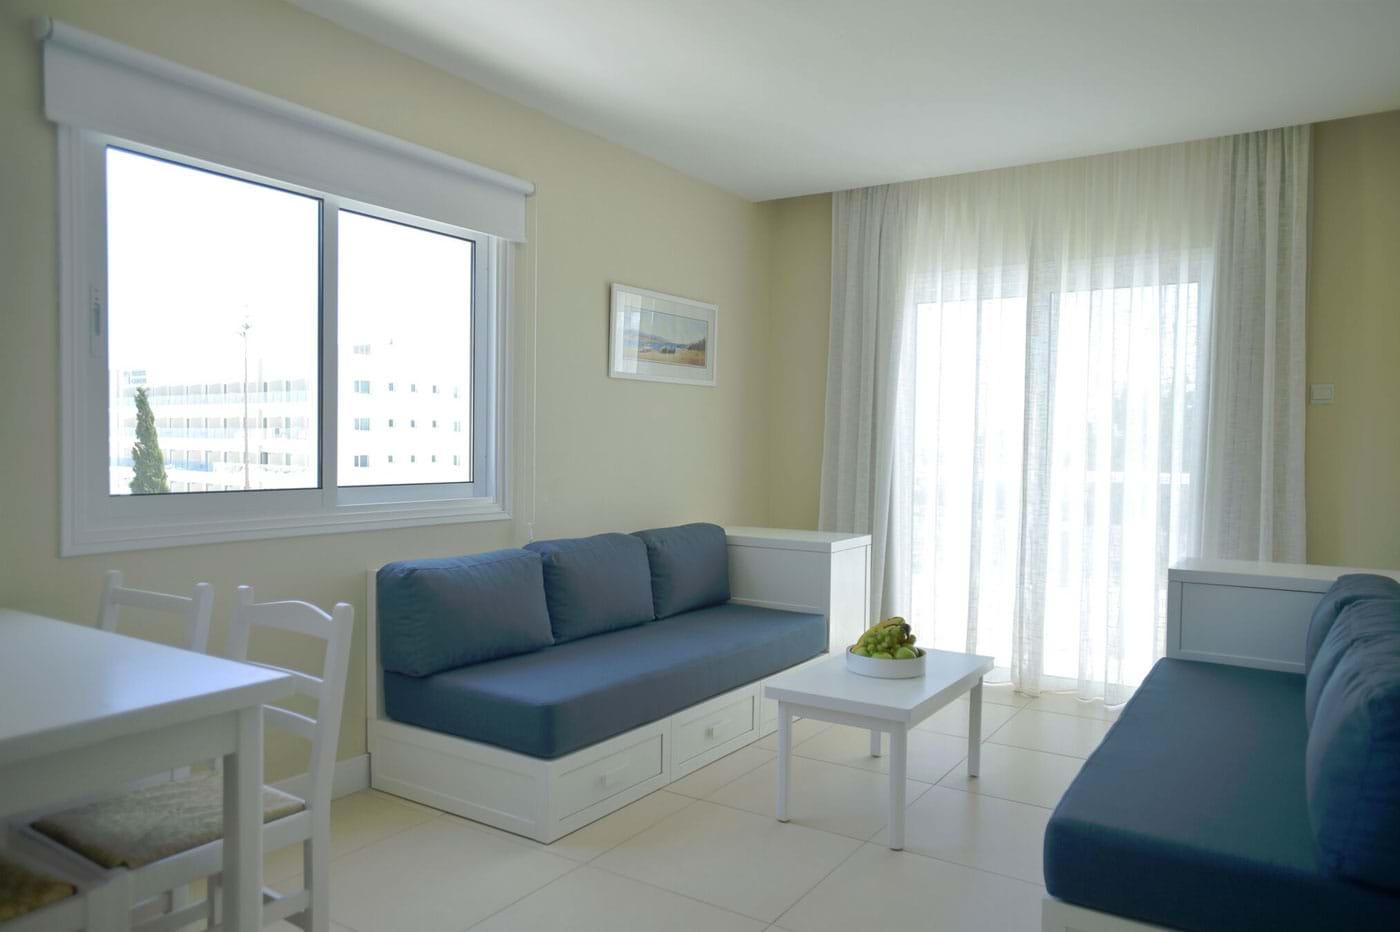 sofa protaras lazy boy bed couch accommodation sunrise gardens hotel apts cyprus